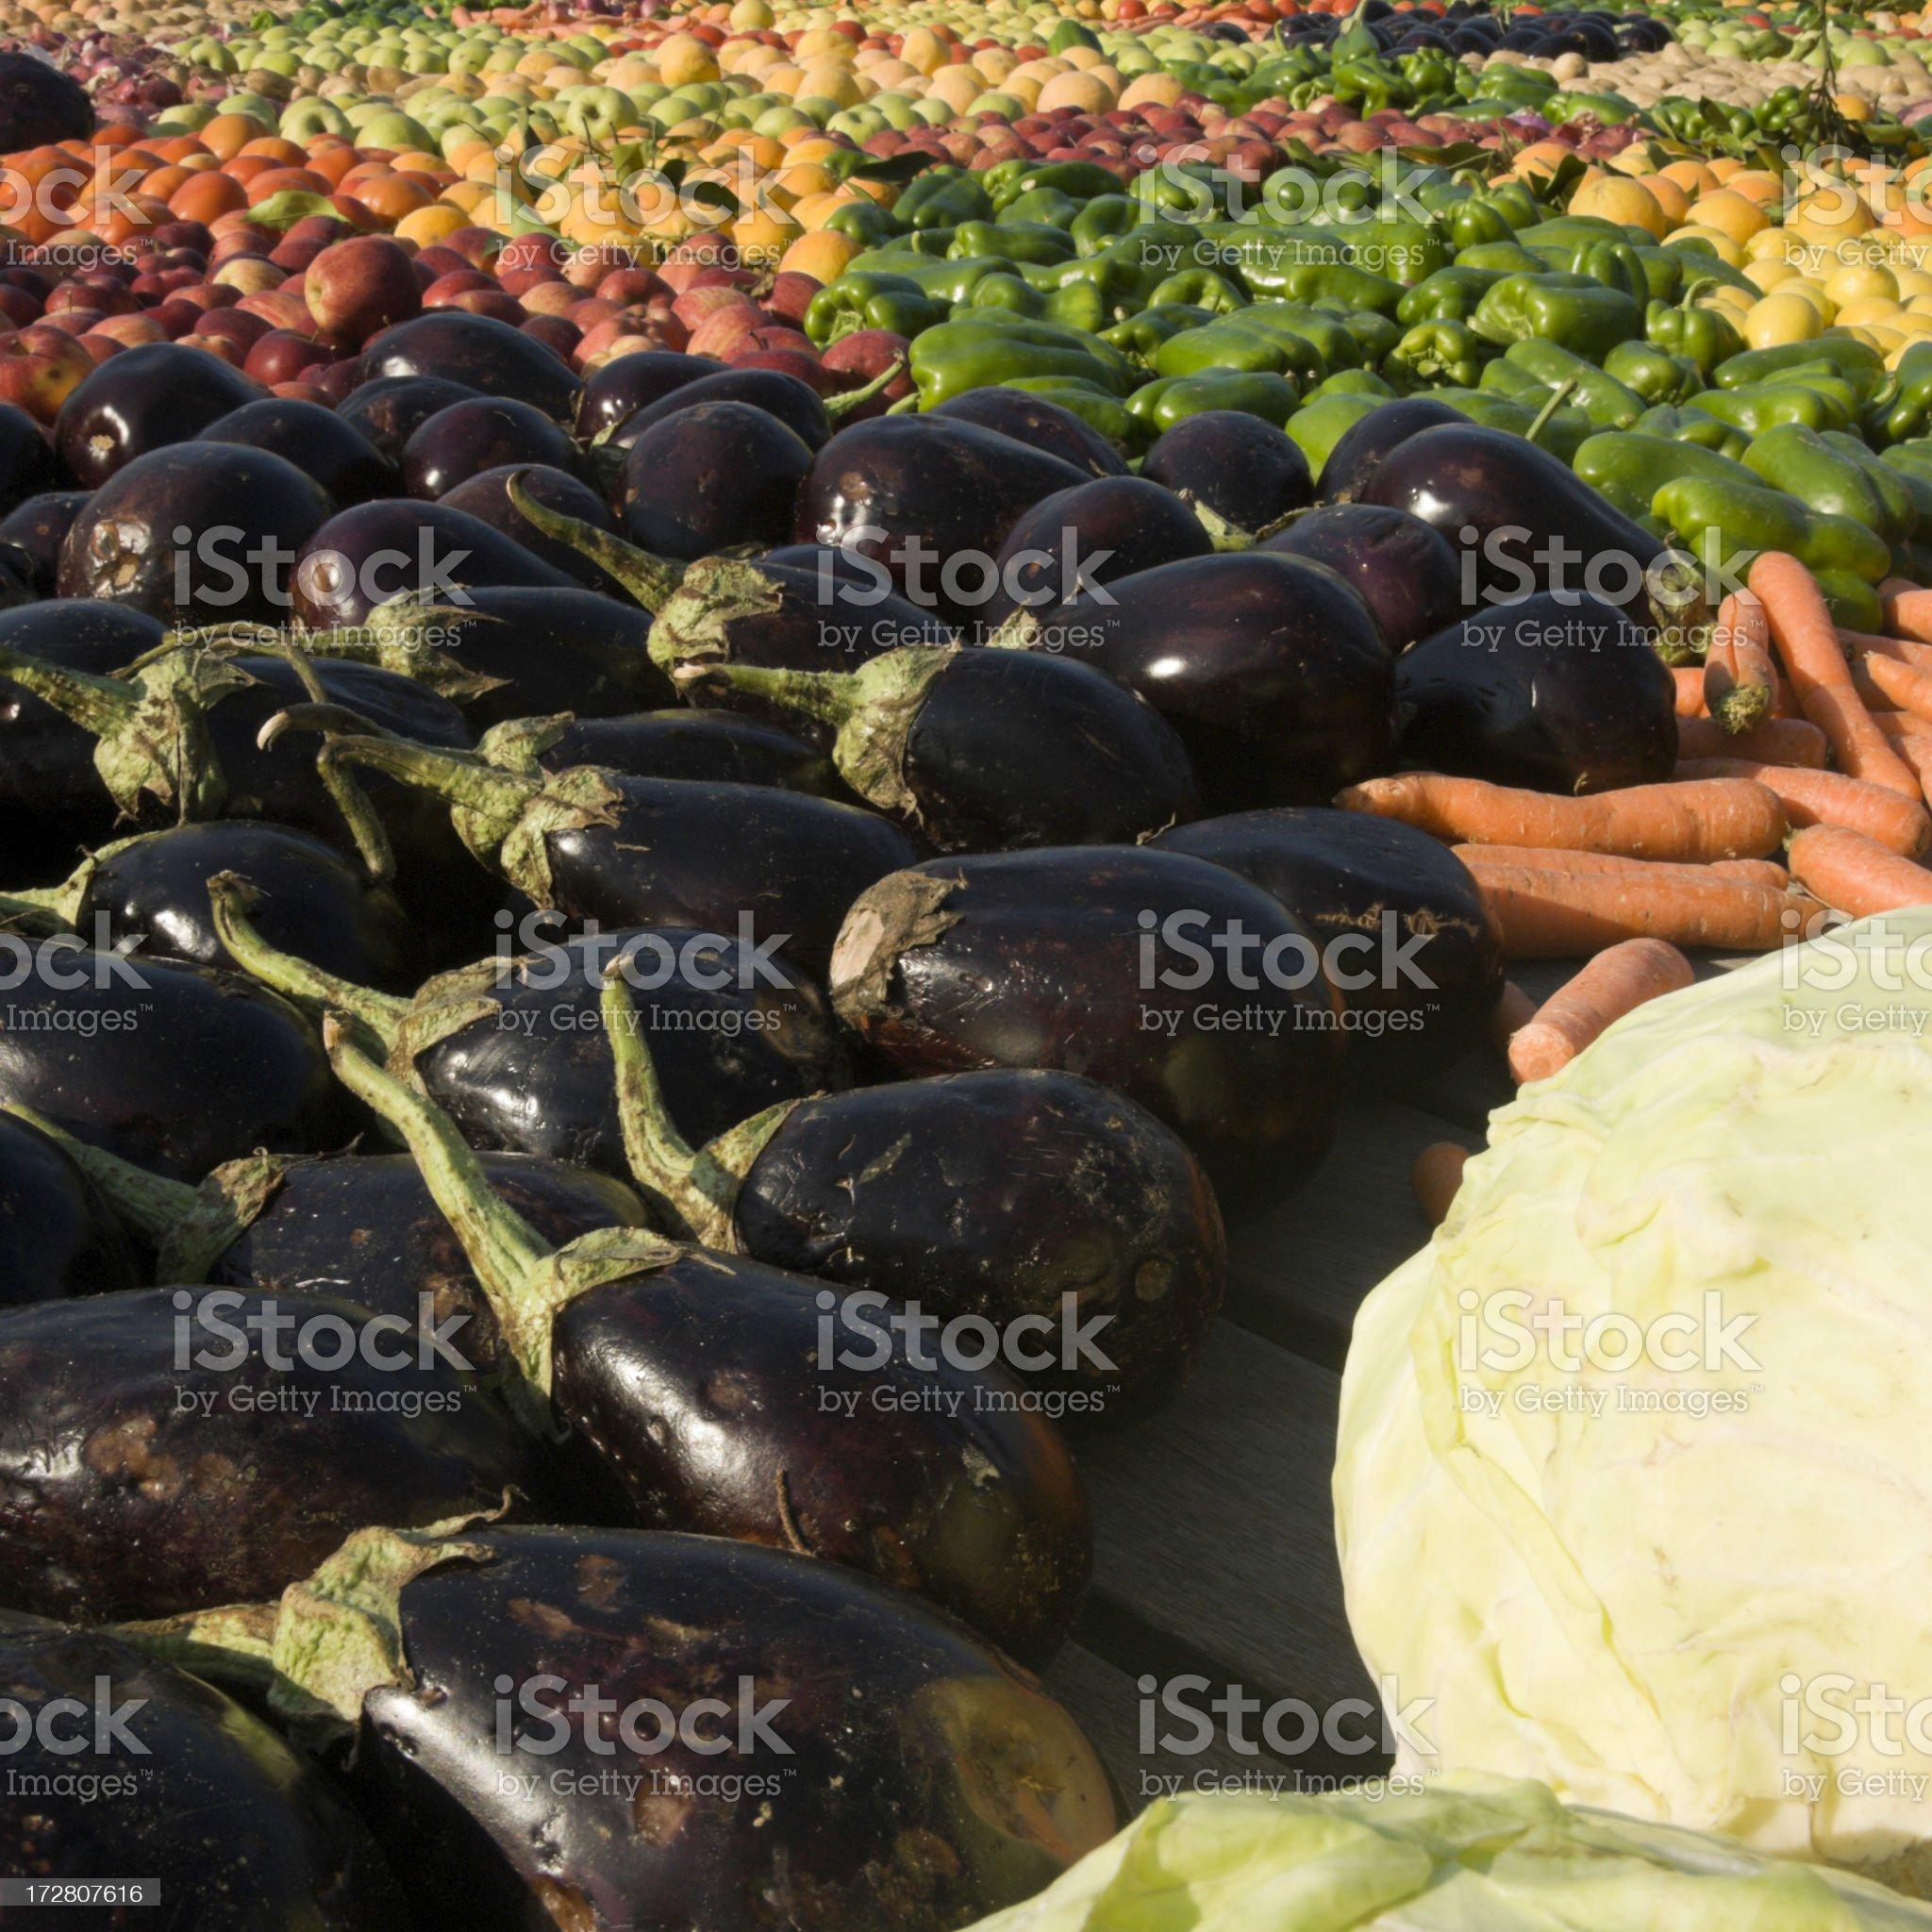 Raw Veggies royalty-free stock photo